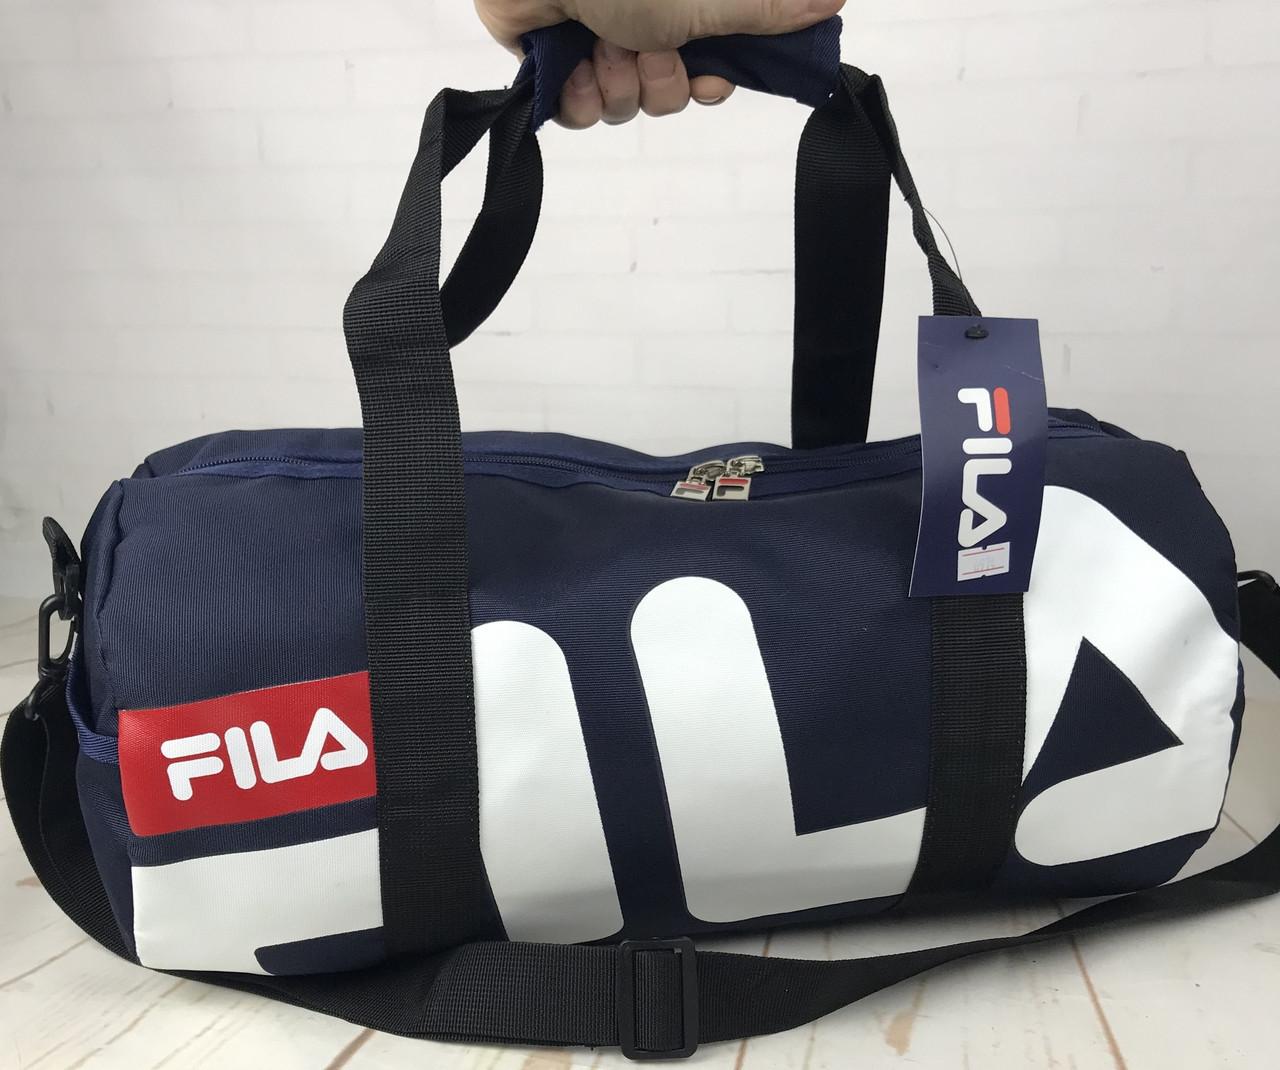 300db4f3744e Небольшая красивая спортивная сумка бочонок Fila. Раз.44см на 23 КСС12-2,  цена 399 грн., купить в Бердянске — Prom.ua (ID#889760350)